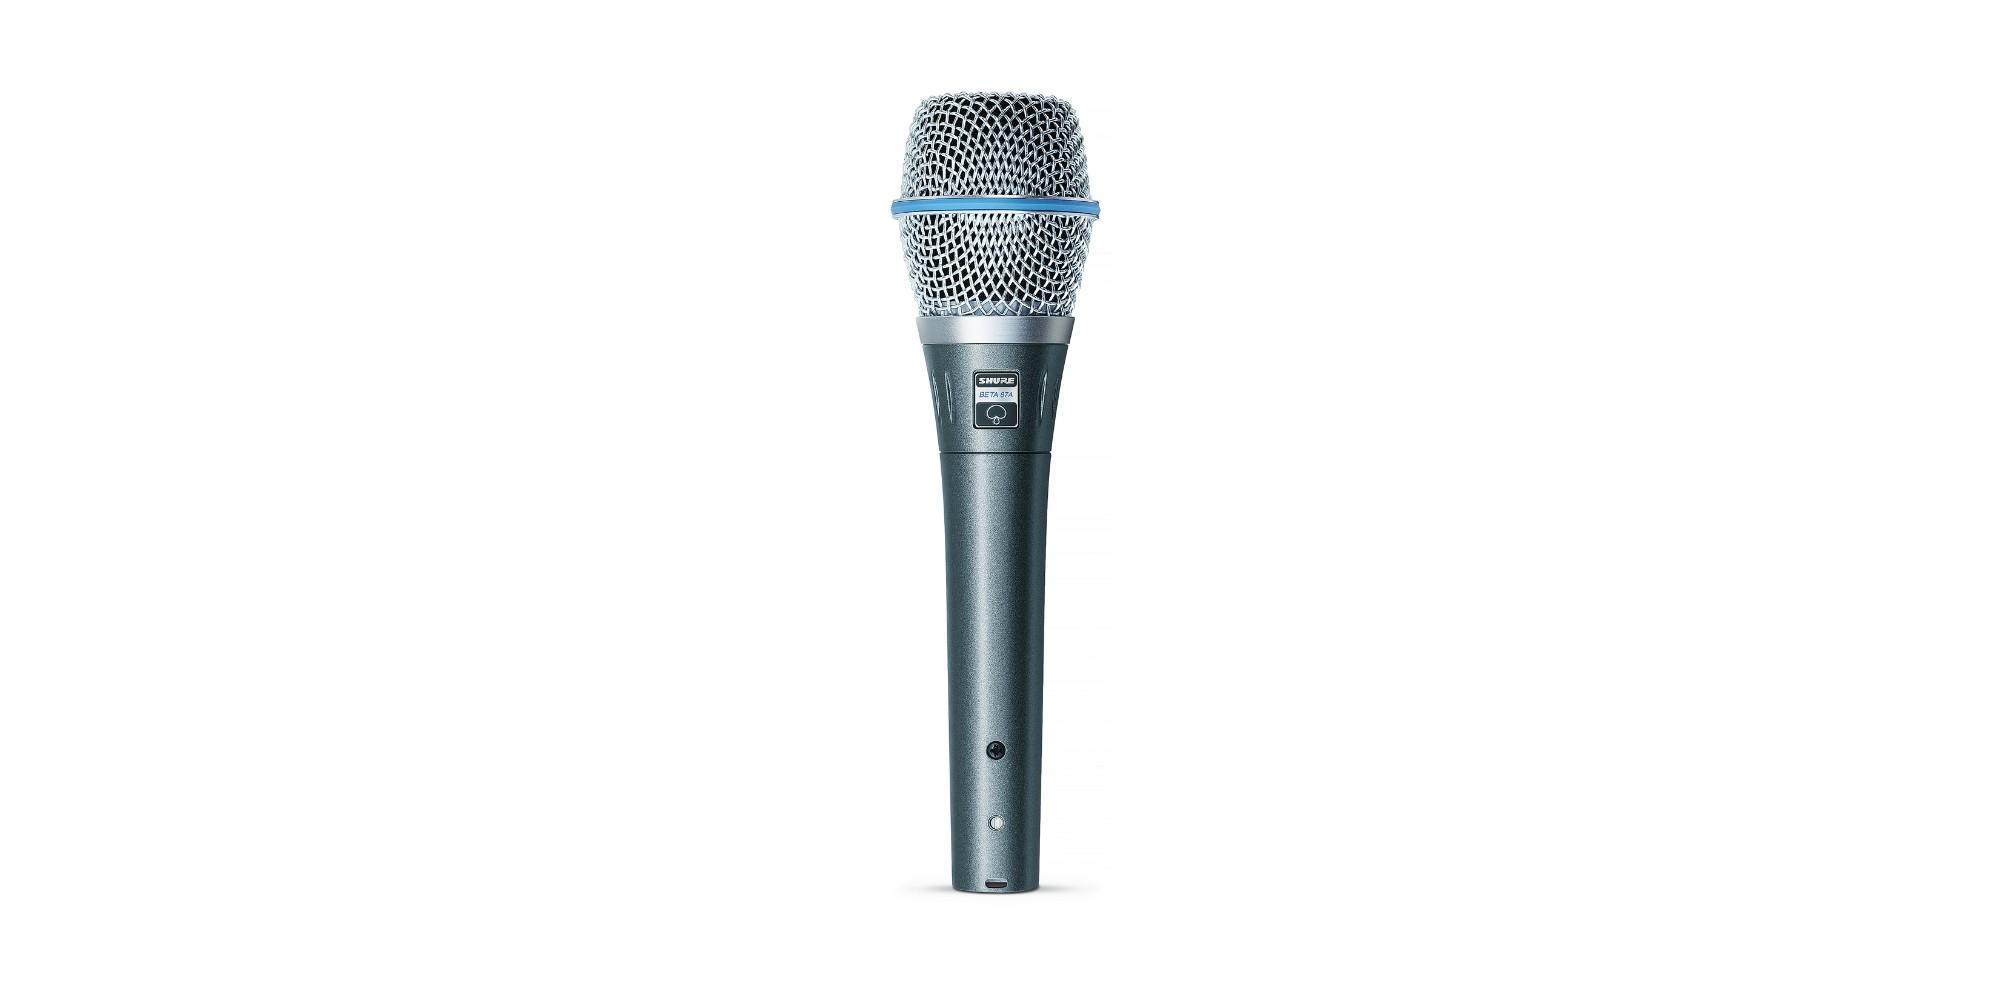 Shure BETA 87A Studio microphone Black